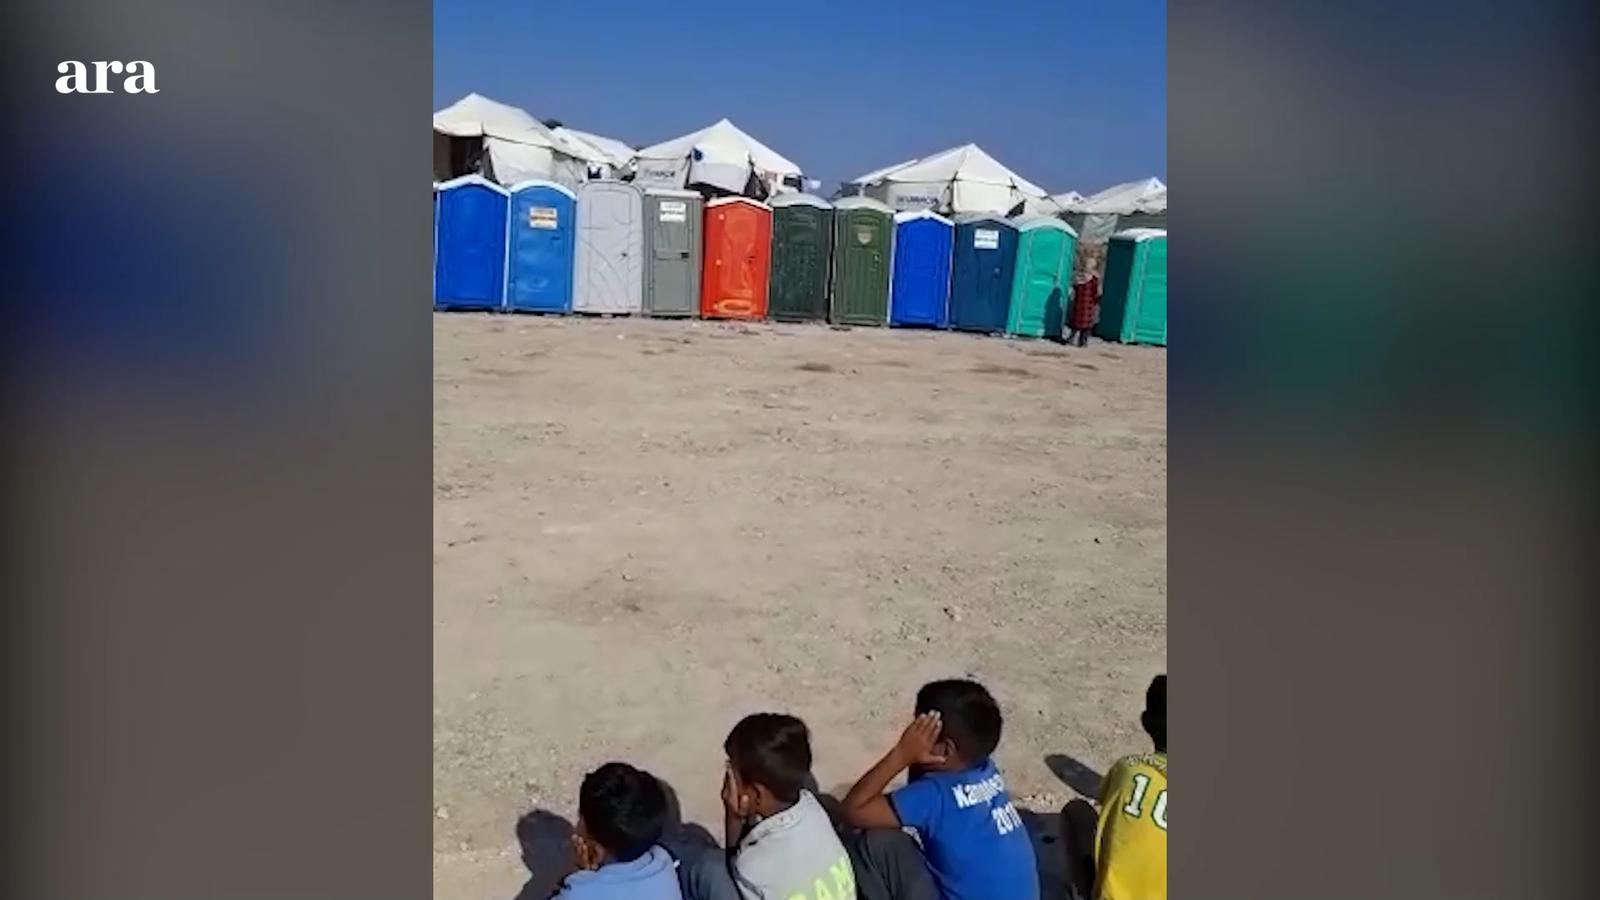 Lavabos  - Camp de refugiats a Lesbos